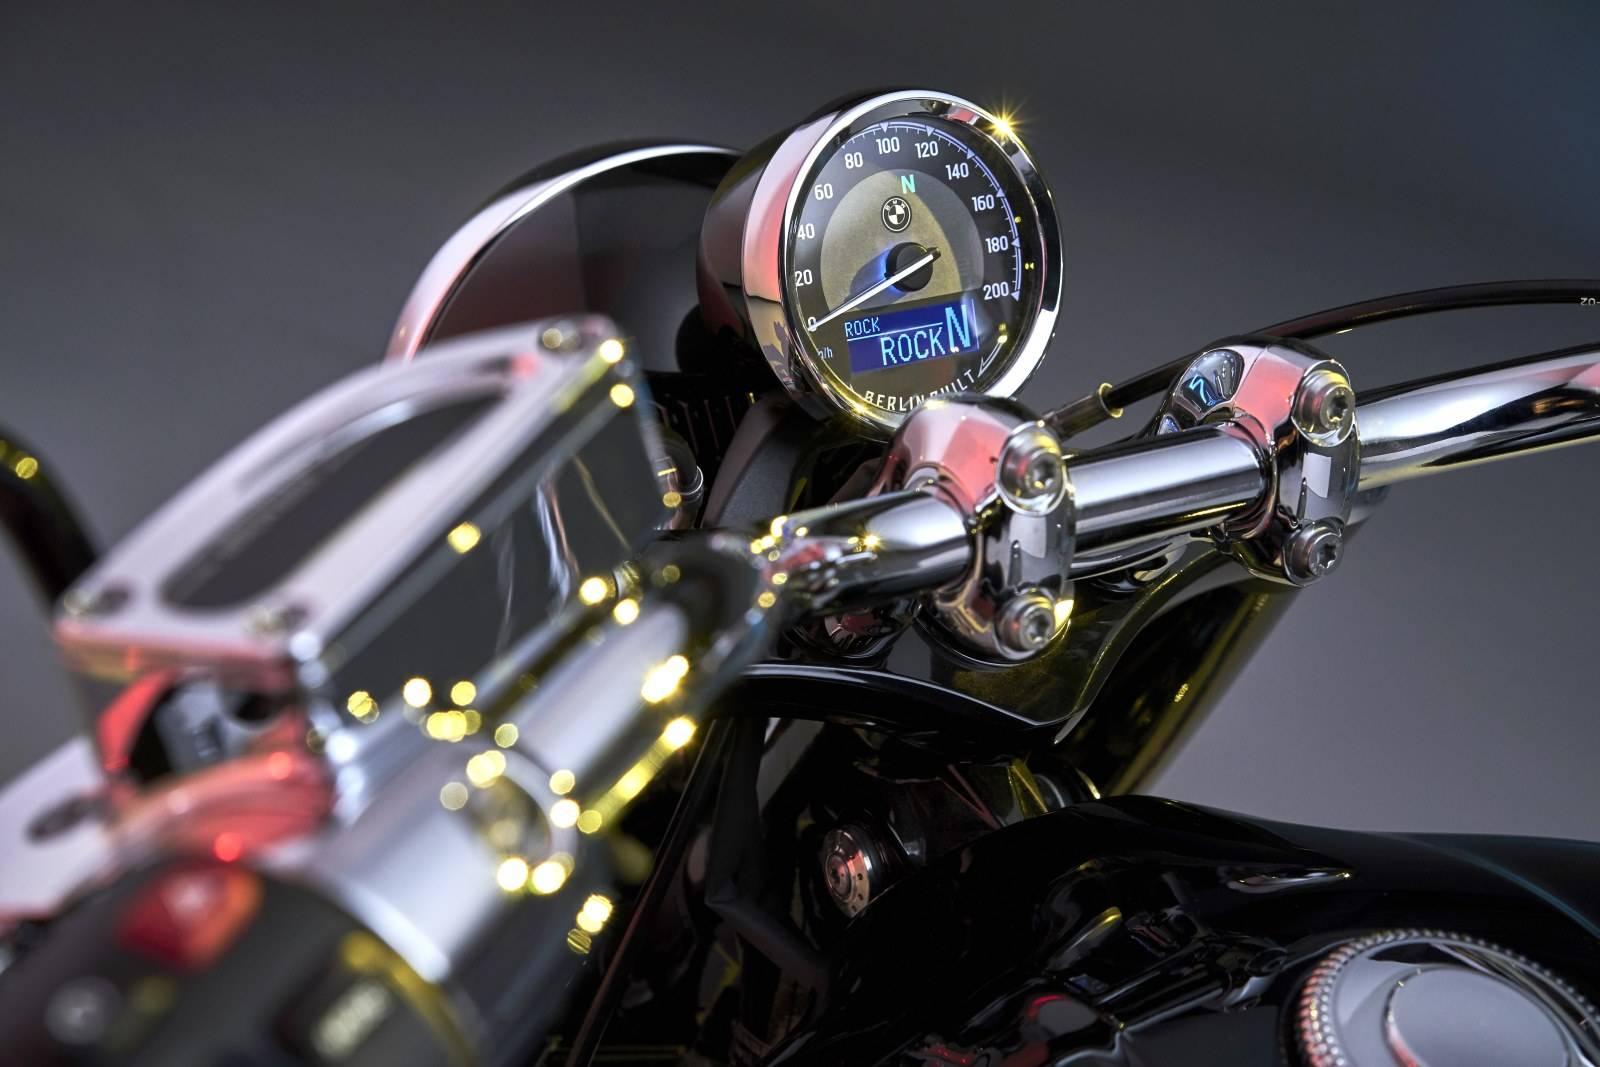 Мотоцикл BMW R 18: новый крузер с диким мотором 6